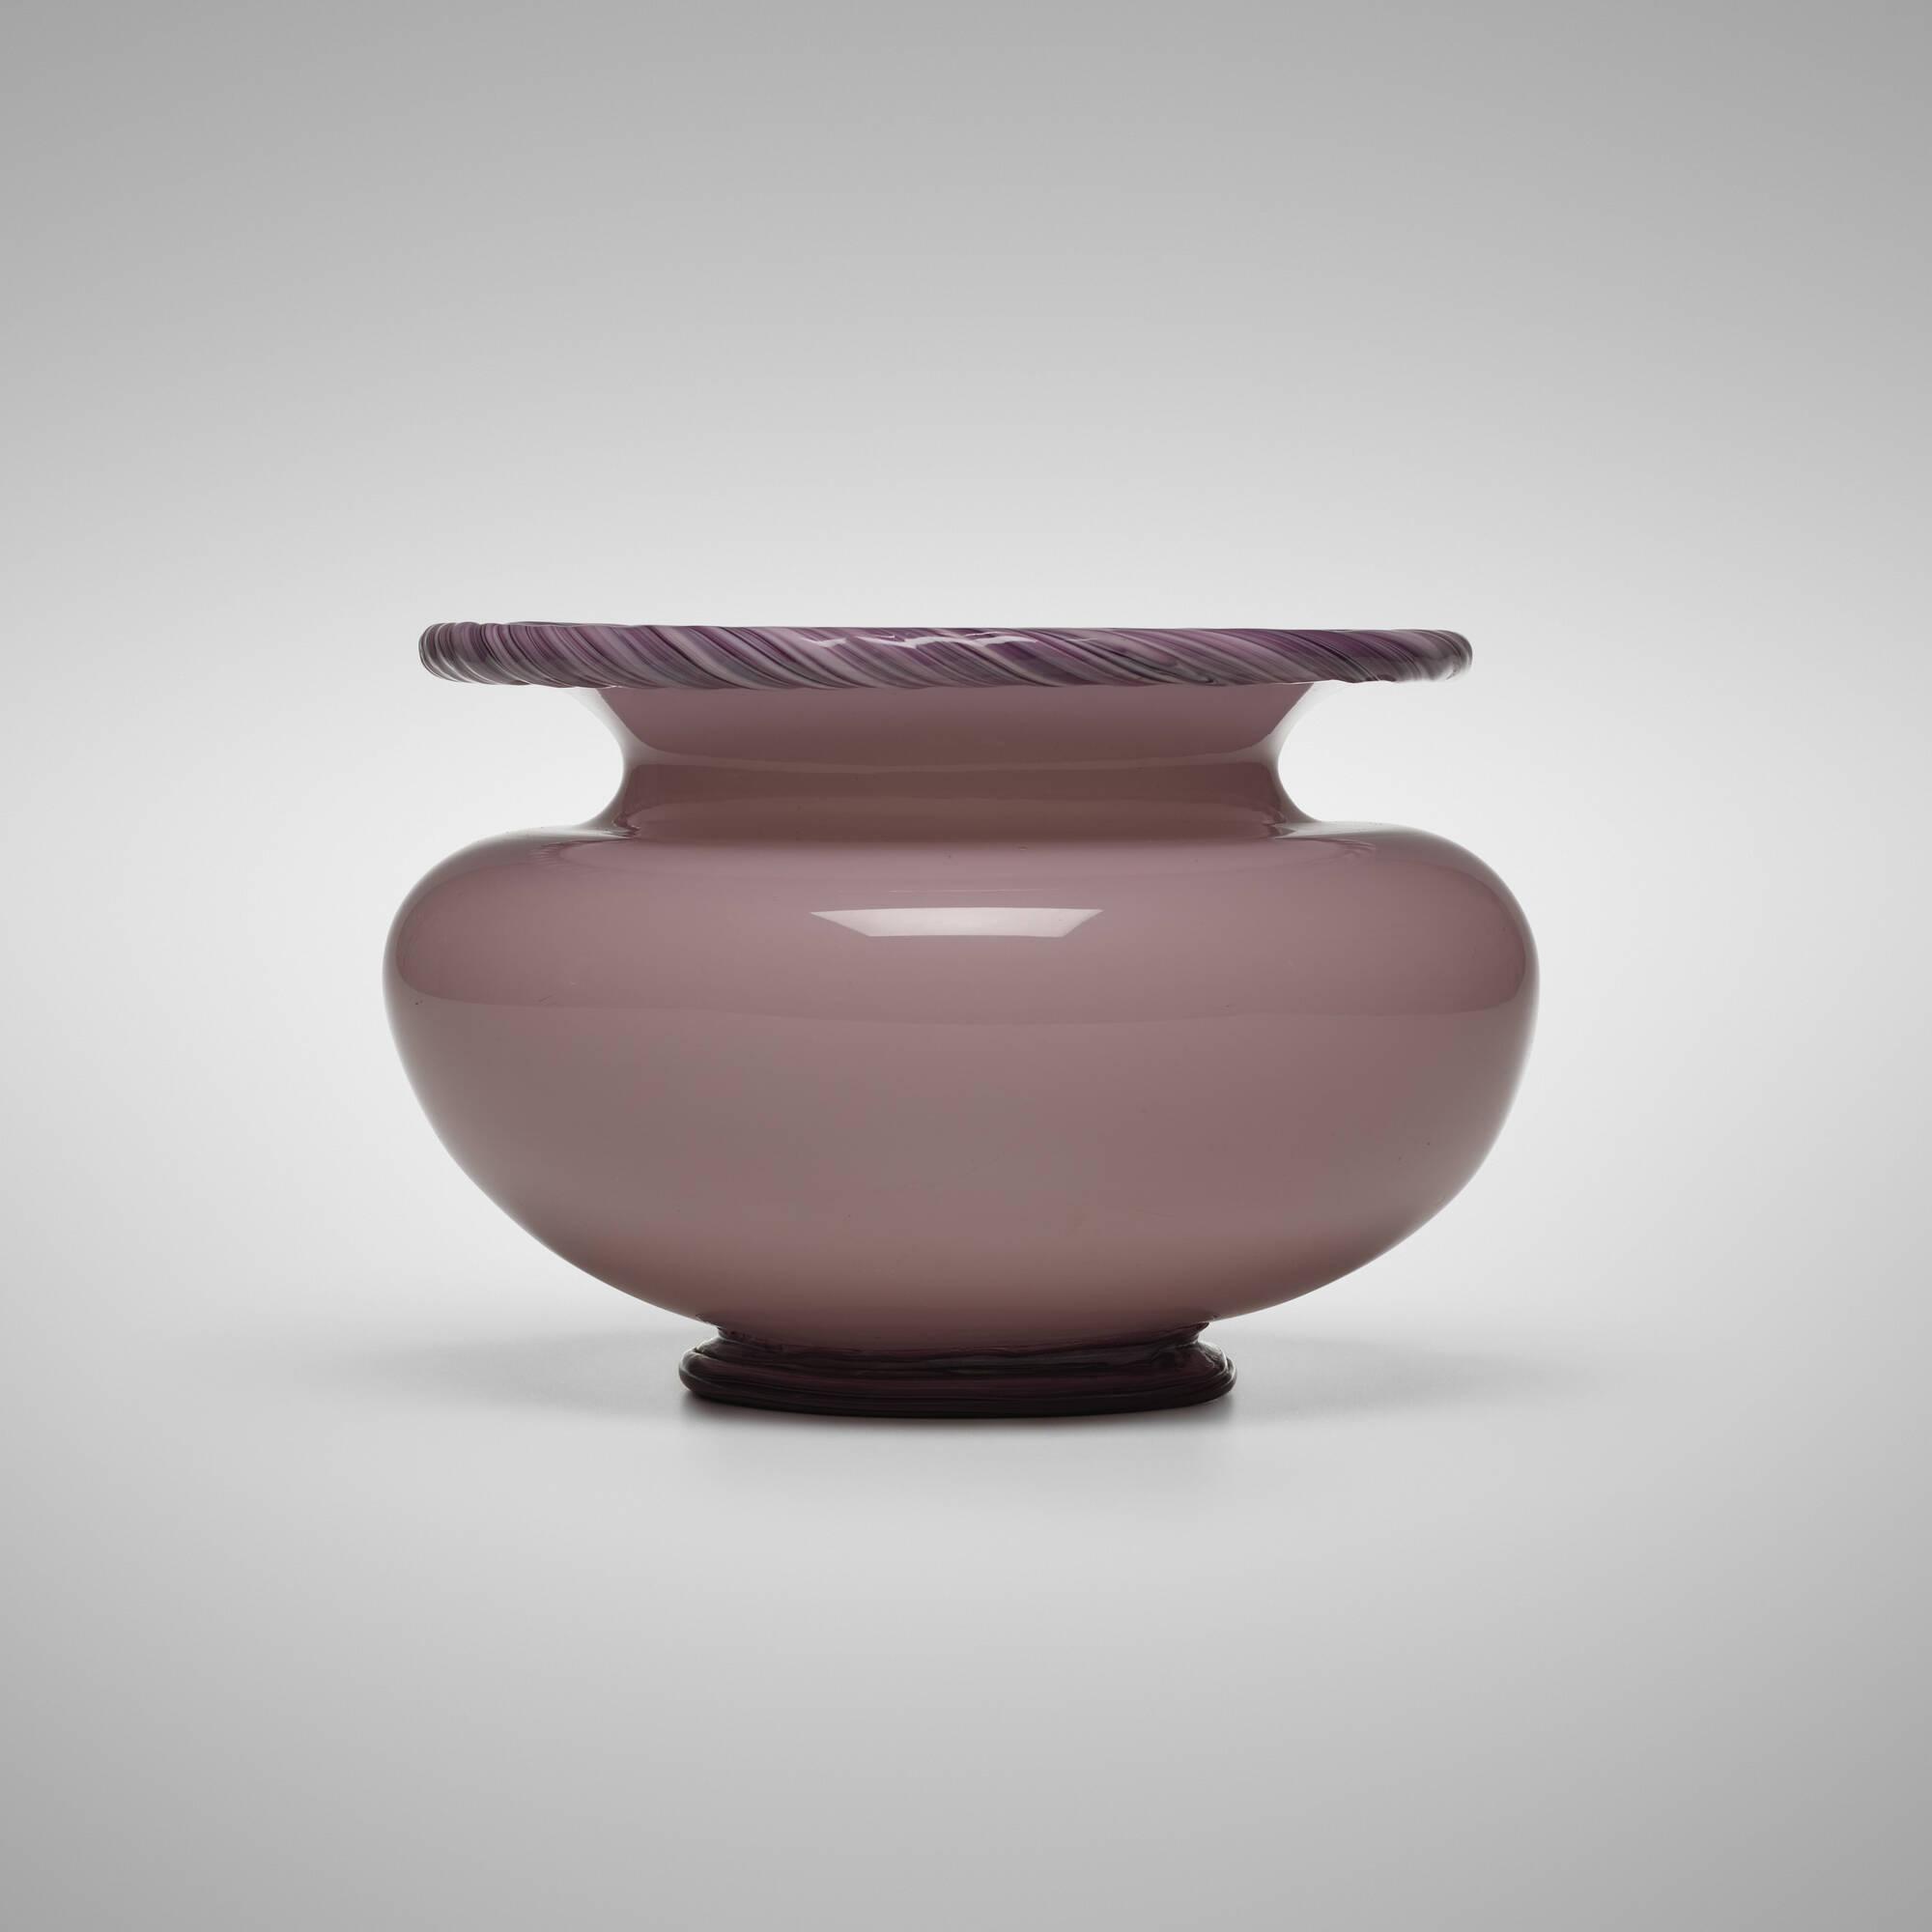 116: Napoleone Martinuzzi / vase, model 3223 (1 of 3)